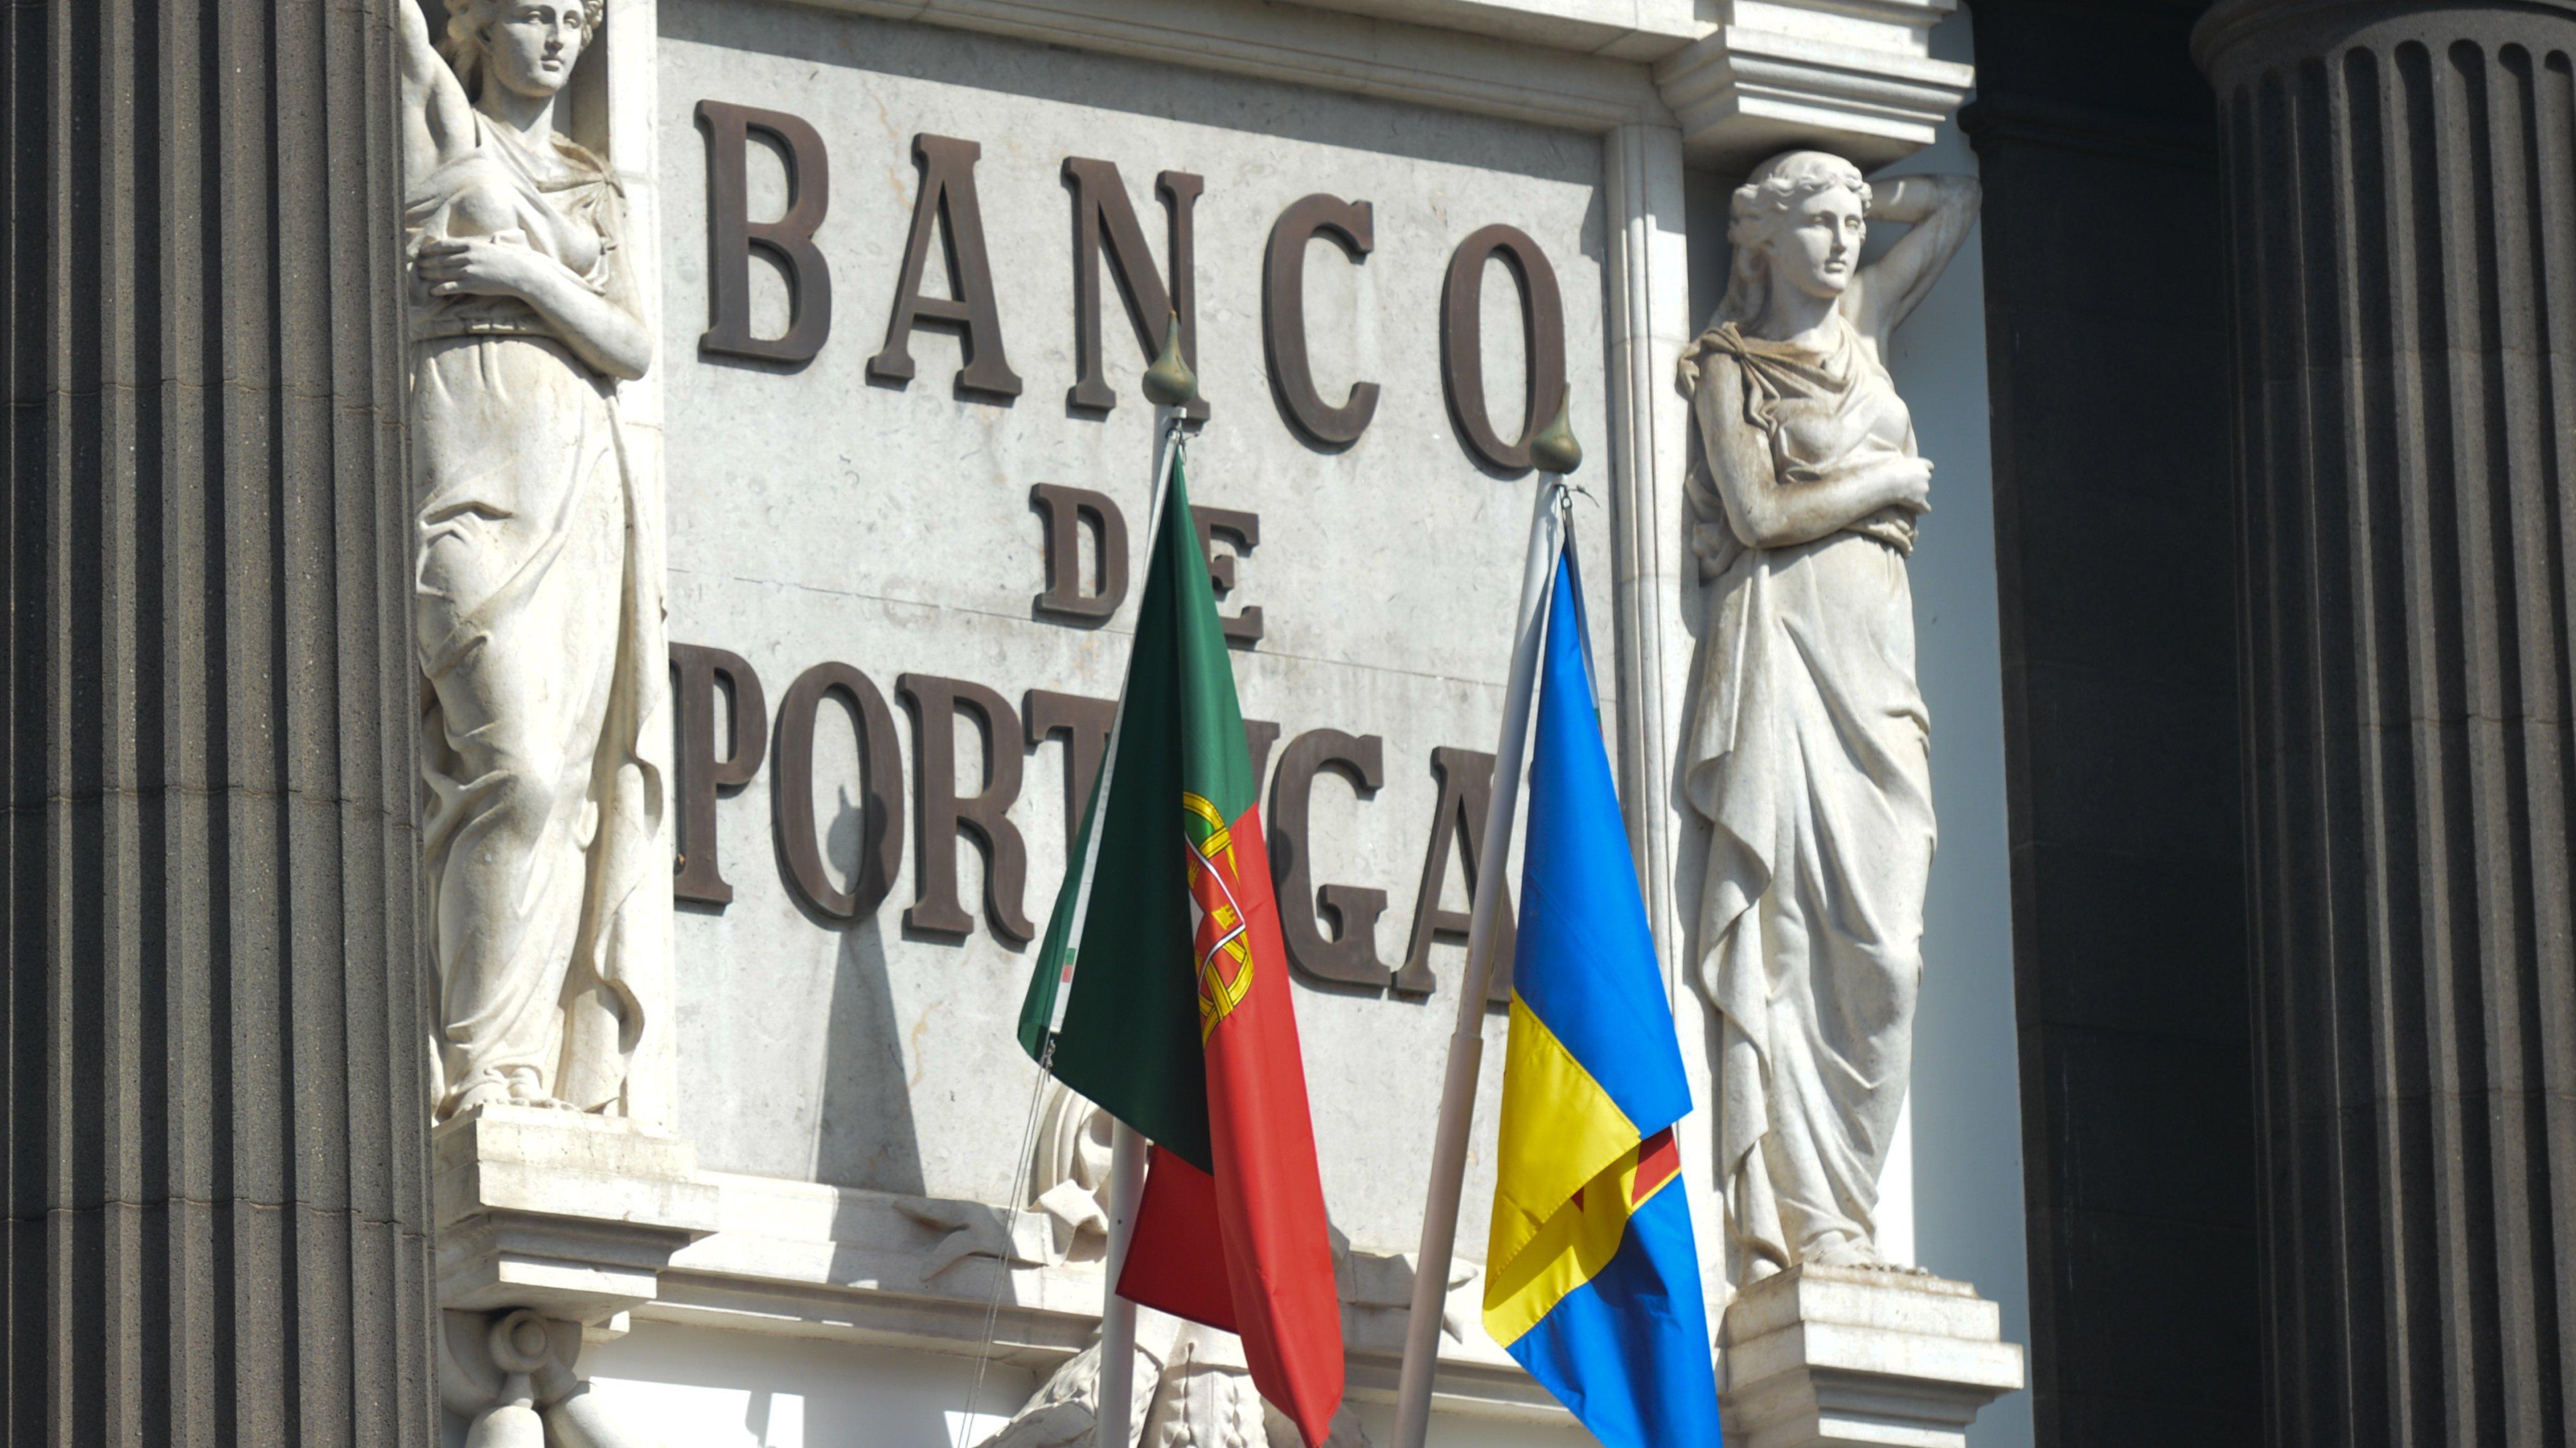 Tour of Funchal, Capital Of Madeira Island